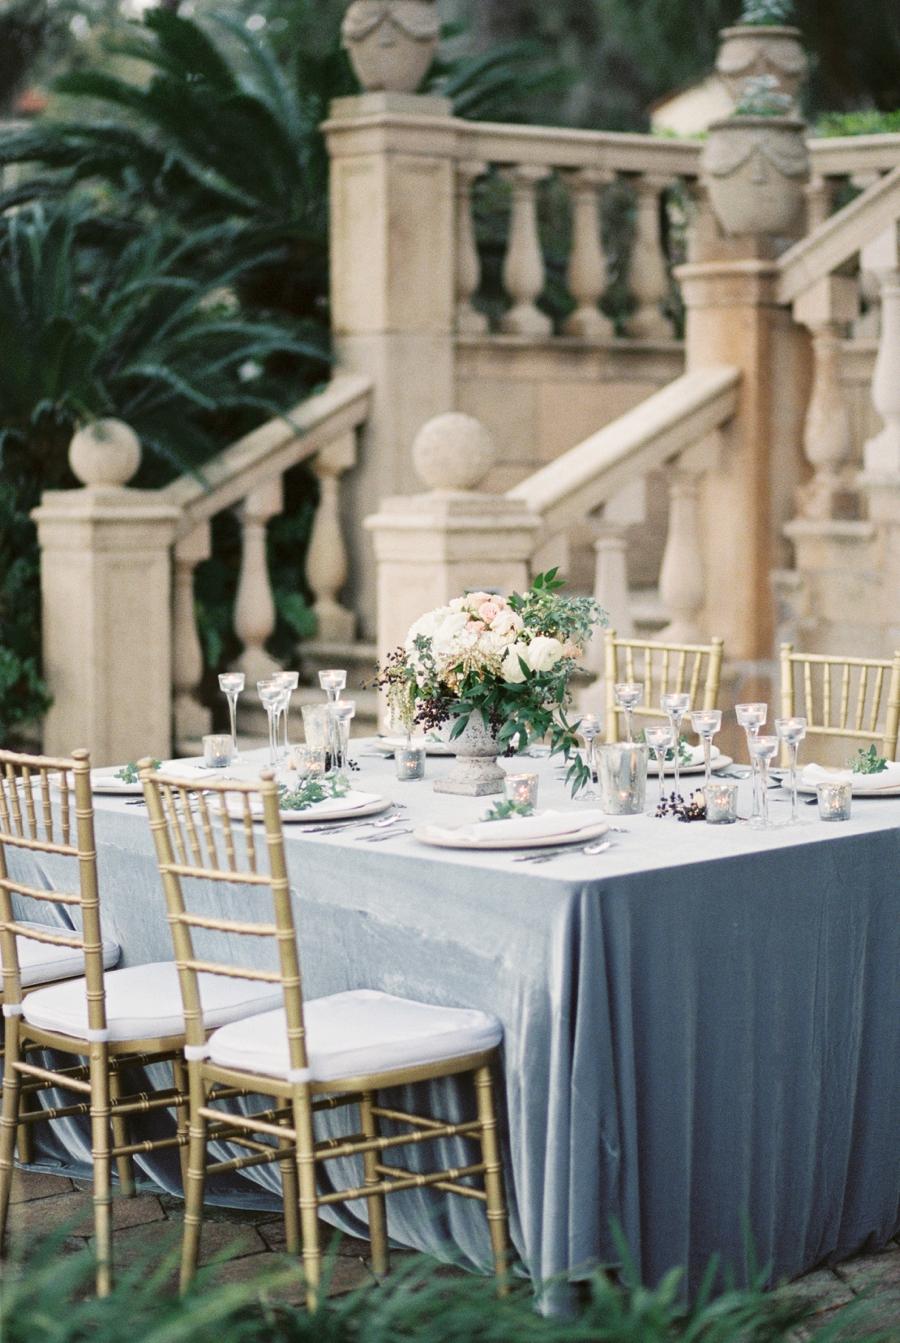 Romantic European Inspired Wedding Ideas via TheELD.com